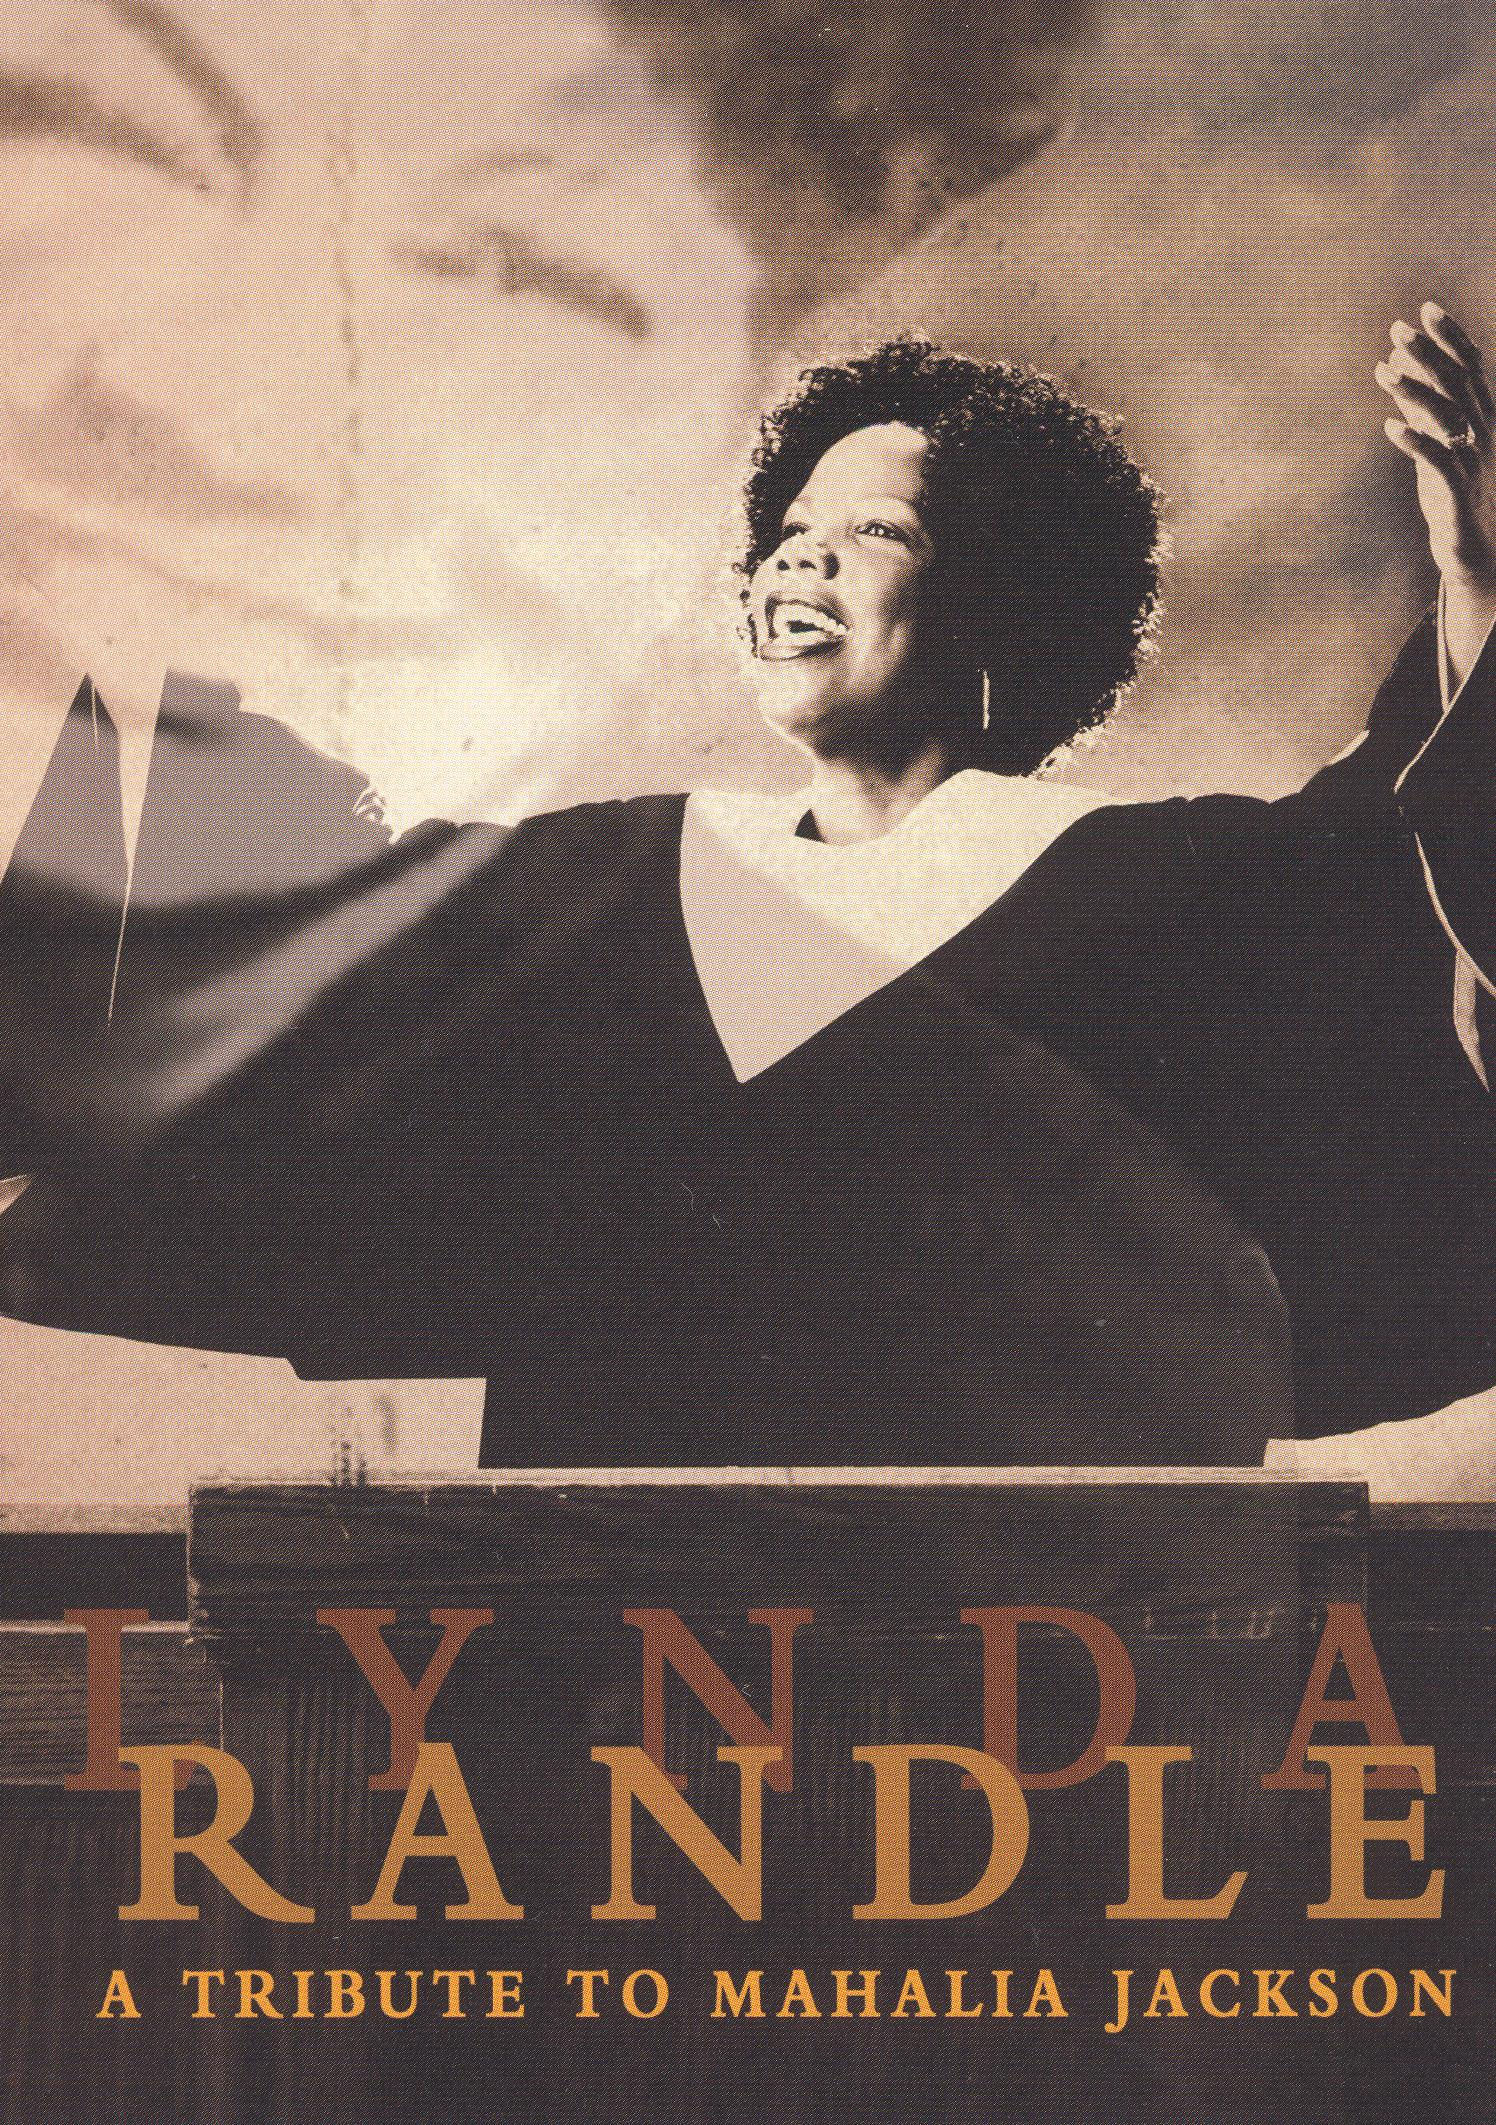 Lynda Randle: A Tribute to Mahalia Jackson